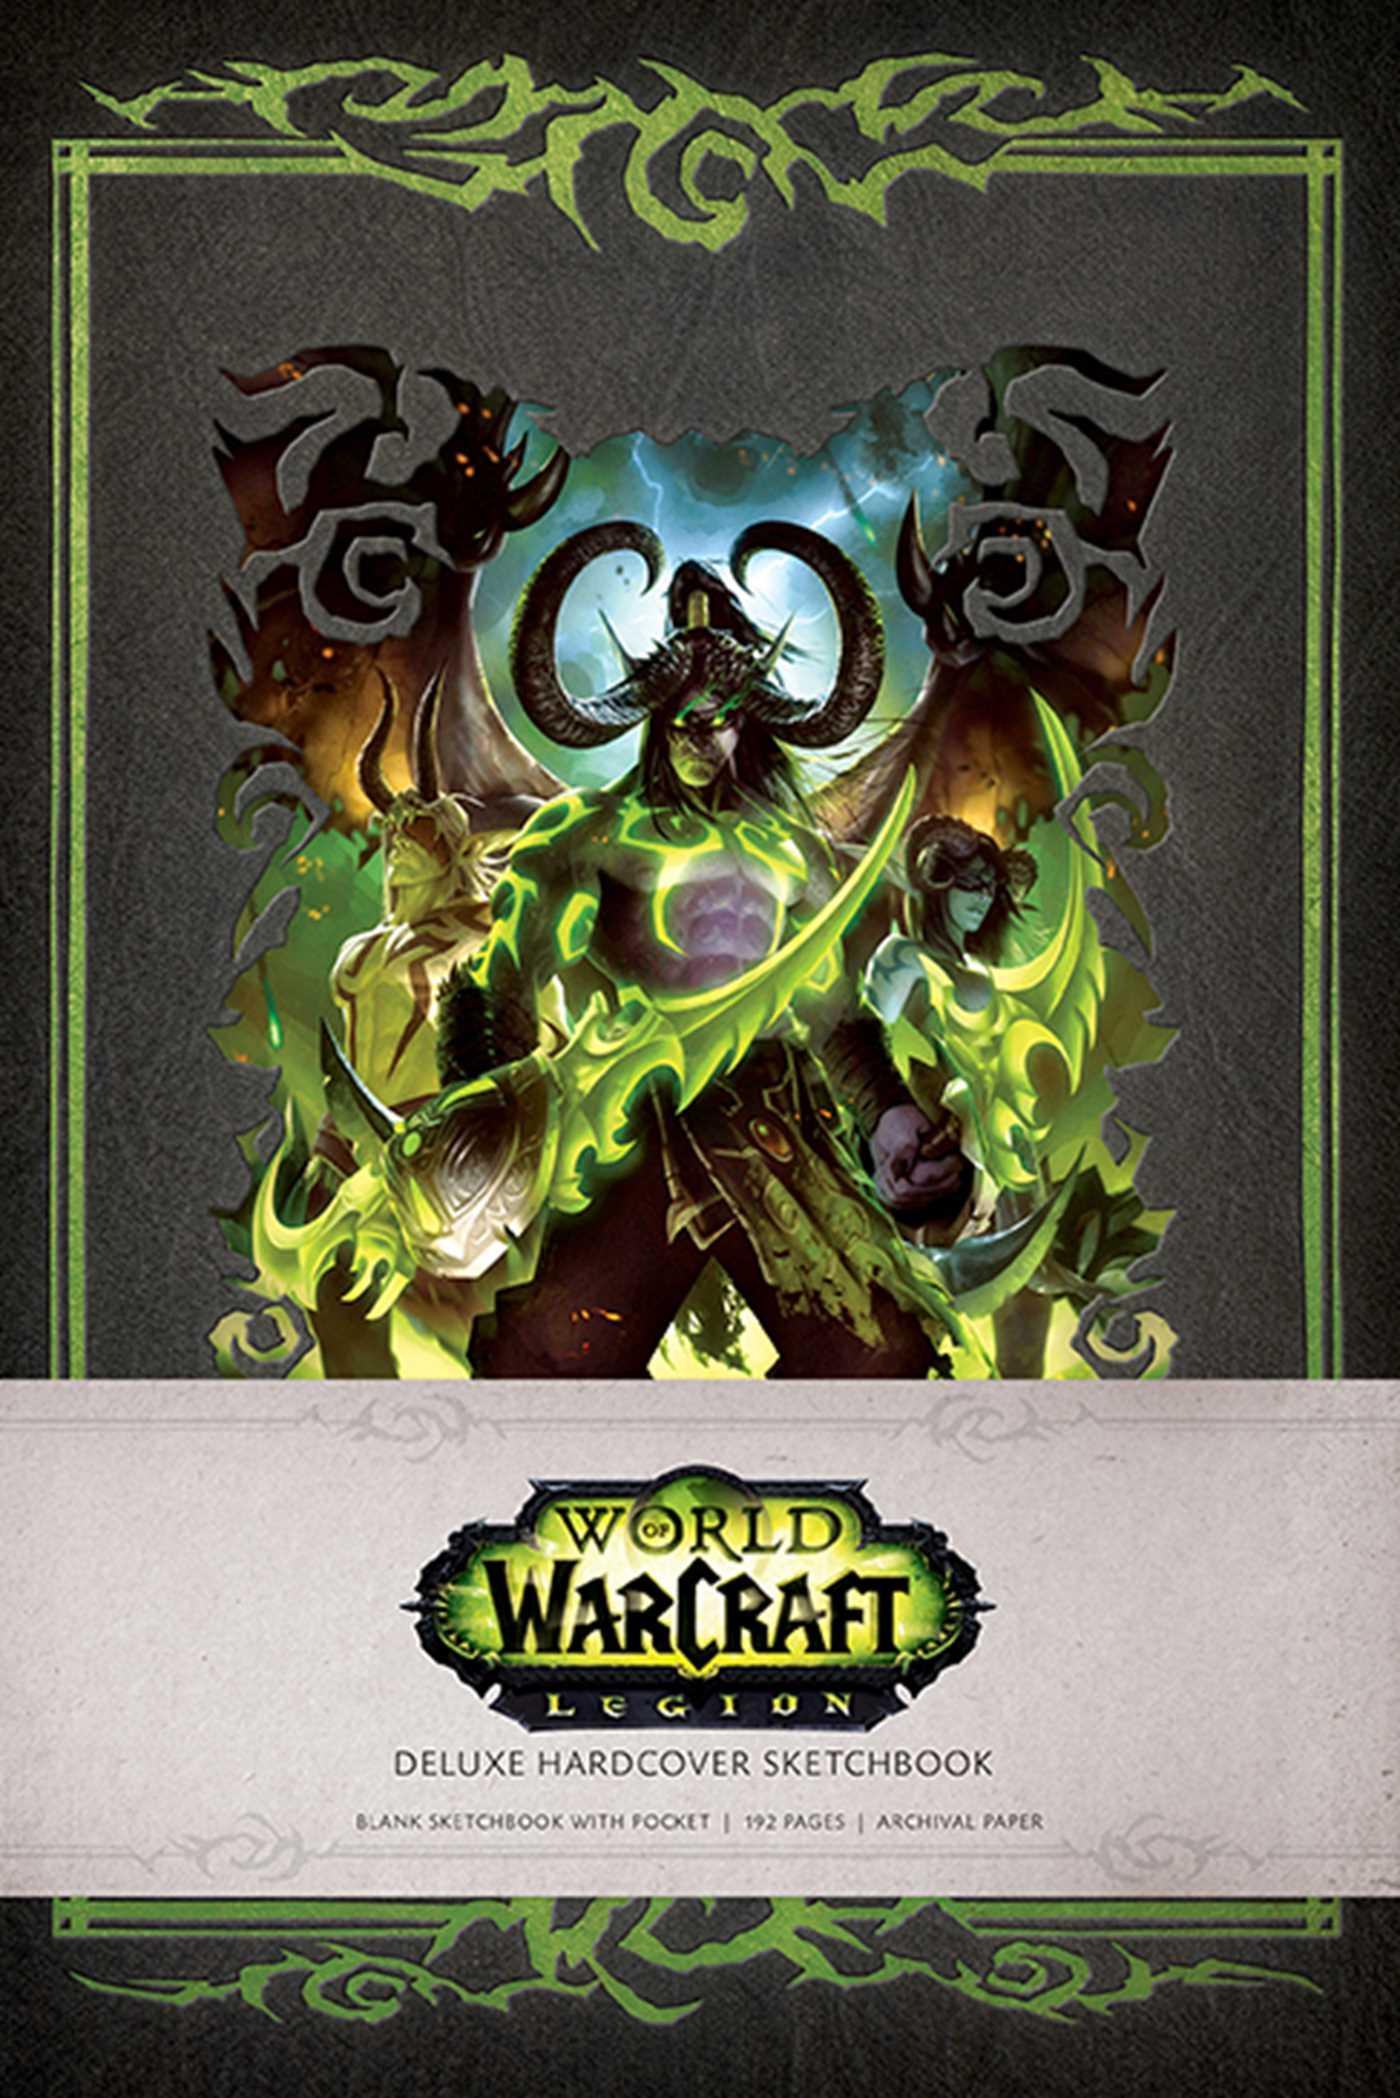 World of warcraft legion hardcover blank sketchbook book by world of warcraft legion hardcover blank sketchbook 9781608876877 hr gumiabroncs Choice Image